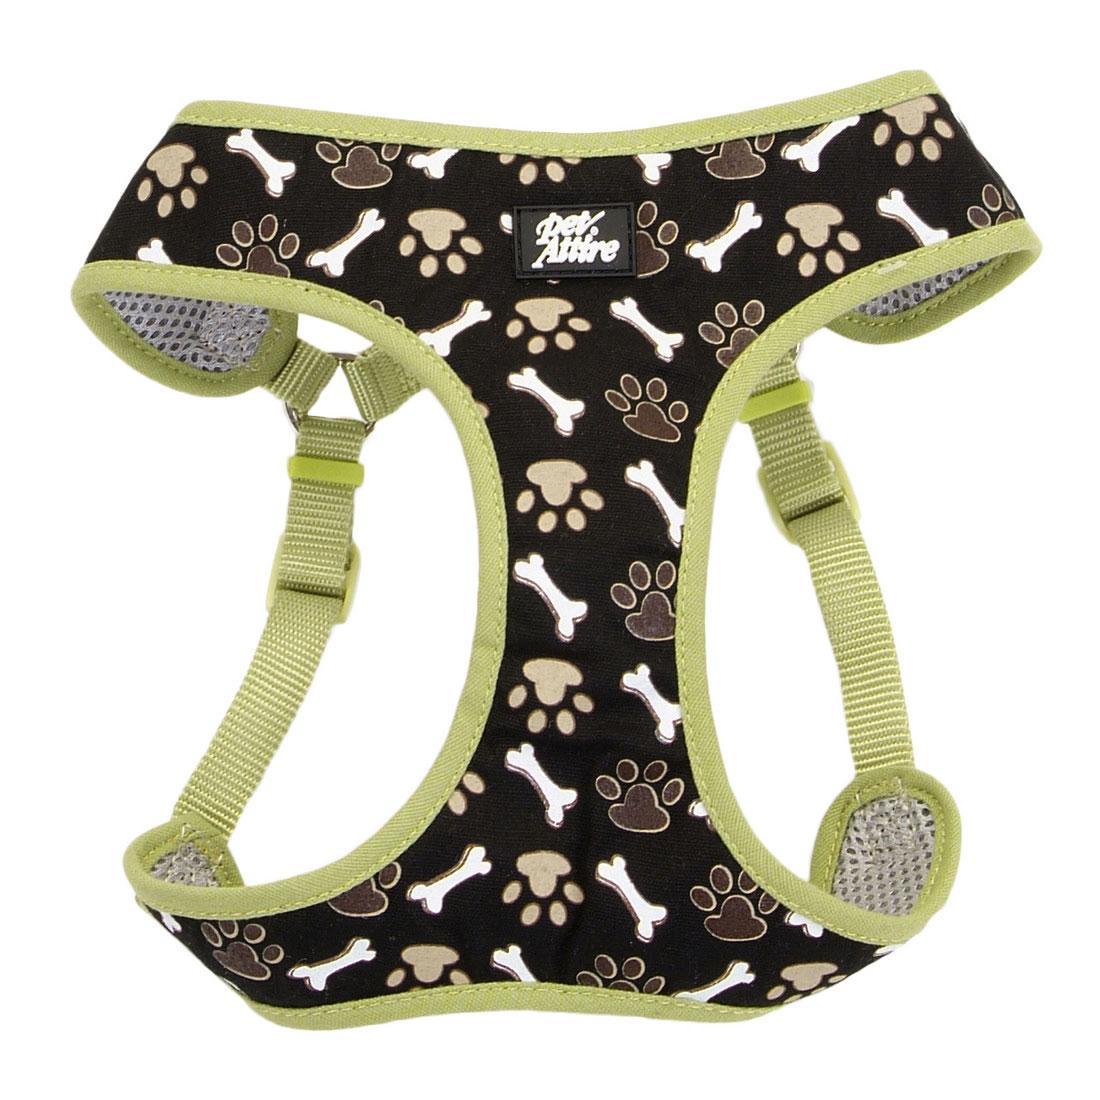 Ribbon Designer Wrap Adjustable Dog Harness, Brown Paws & Bones, 5/8-in x 19-23-in